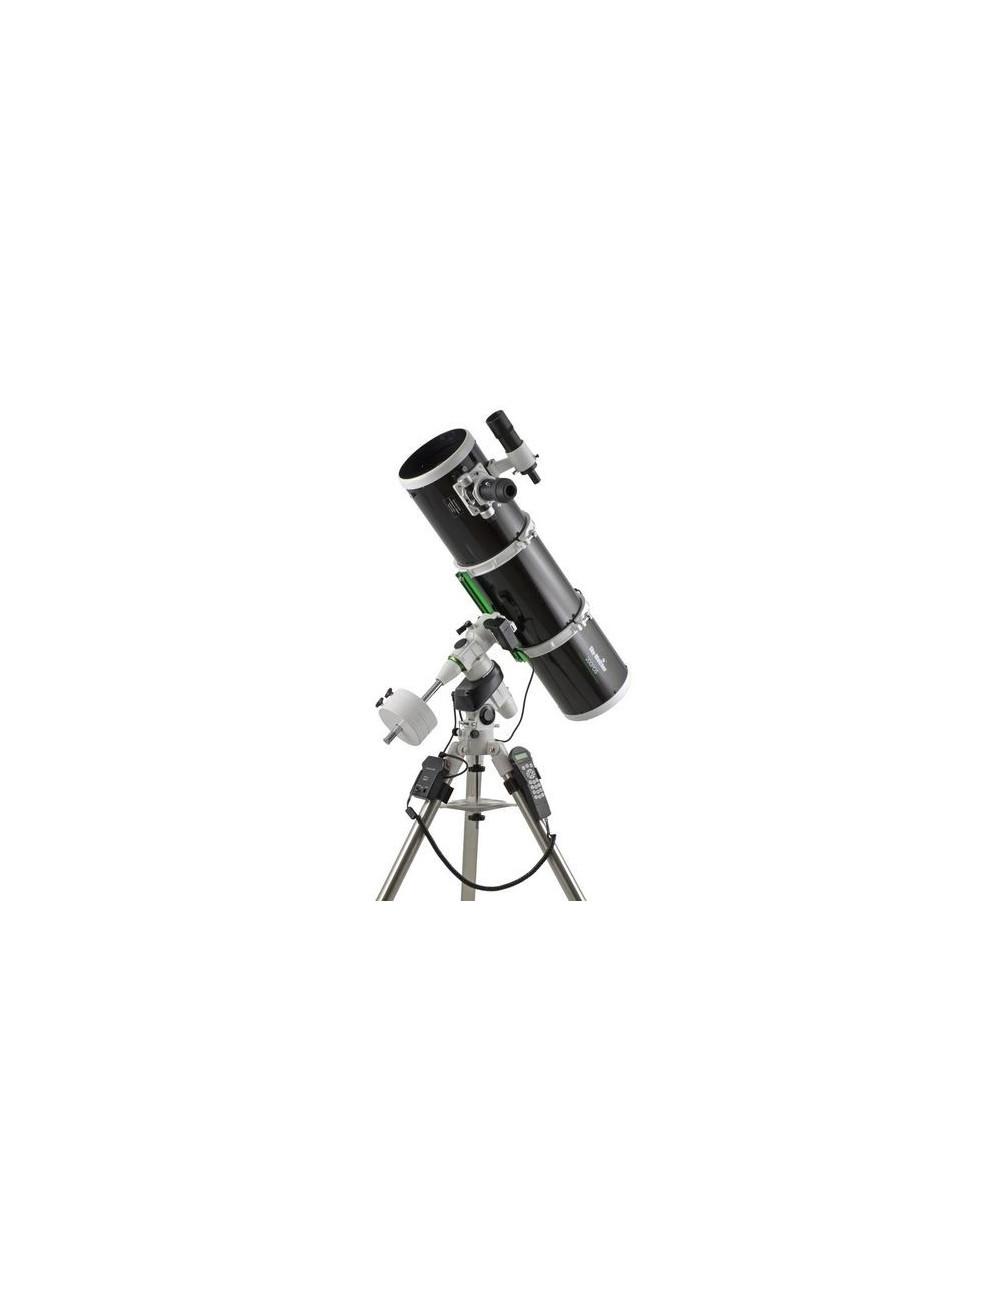 Télescope Sky-Watcher 200/1000 Dual Speed sur NEQ5 Pro Go-To BD